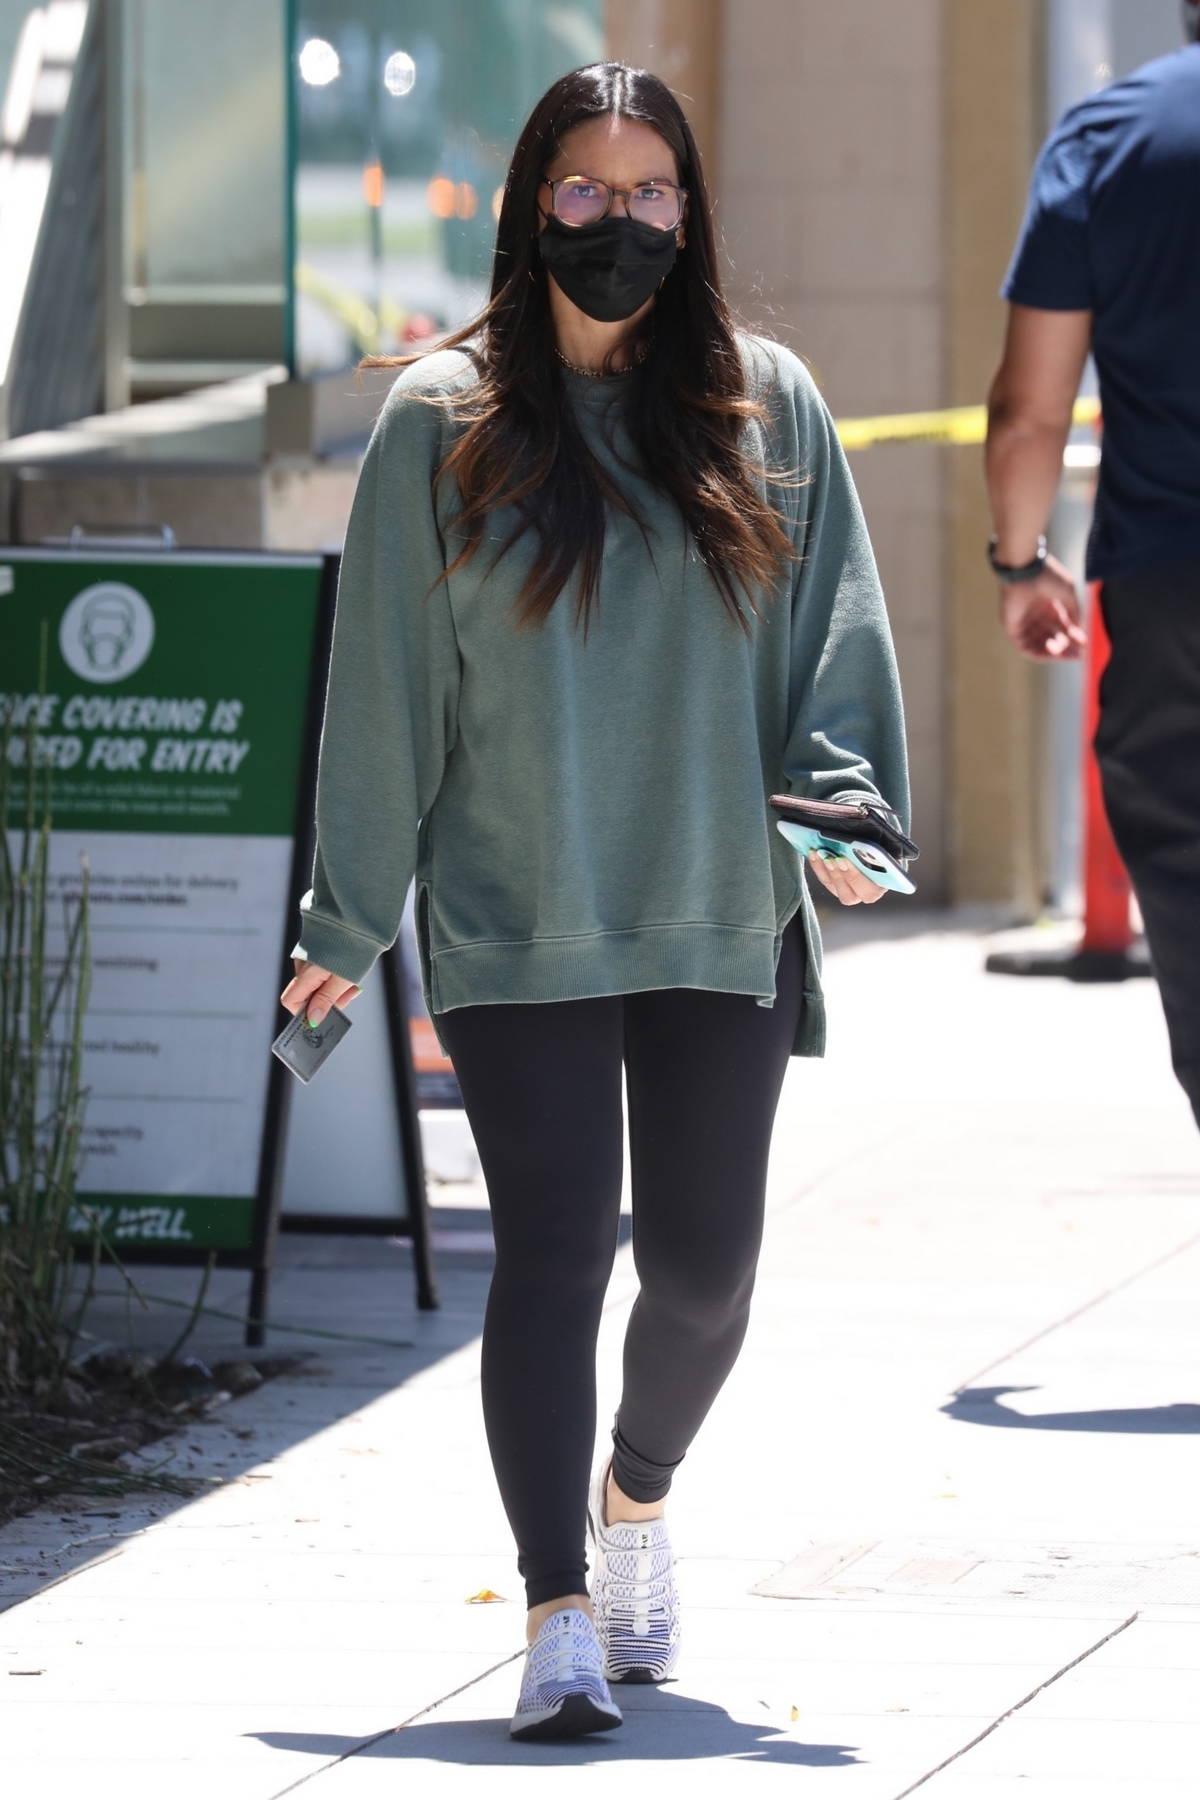 Olivia Munn leaves an office wearing a comfy green sweatshirt and black leggings in Santa Monica, California